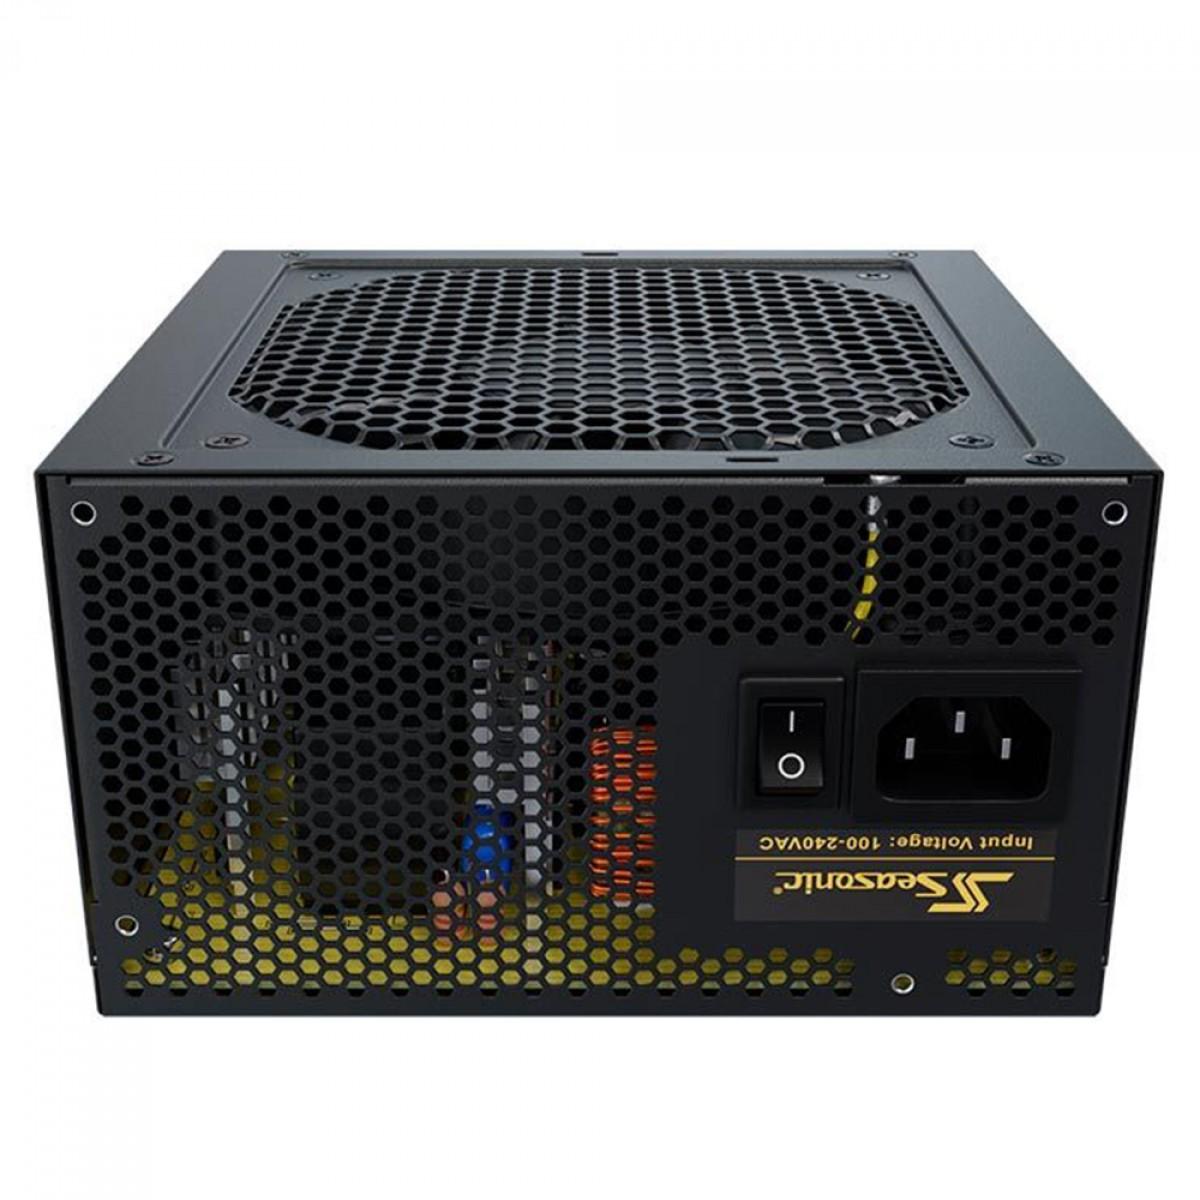 Fonte Seasonic Core GM-550, 550W, 80 Plus Gold, Semi Modular